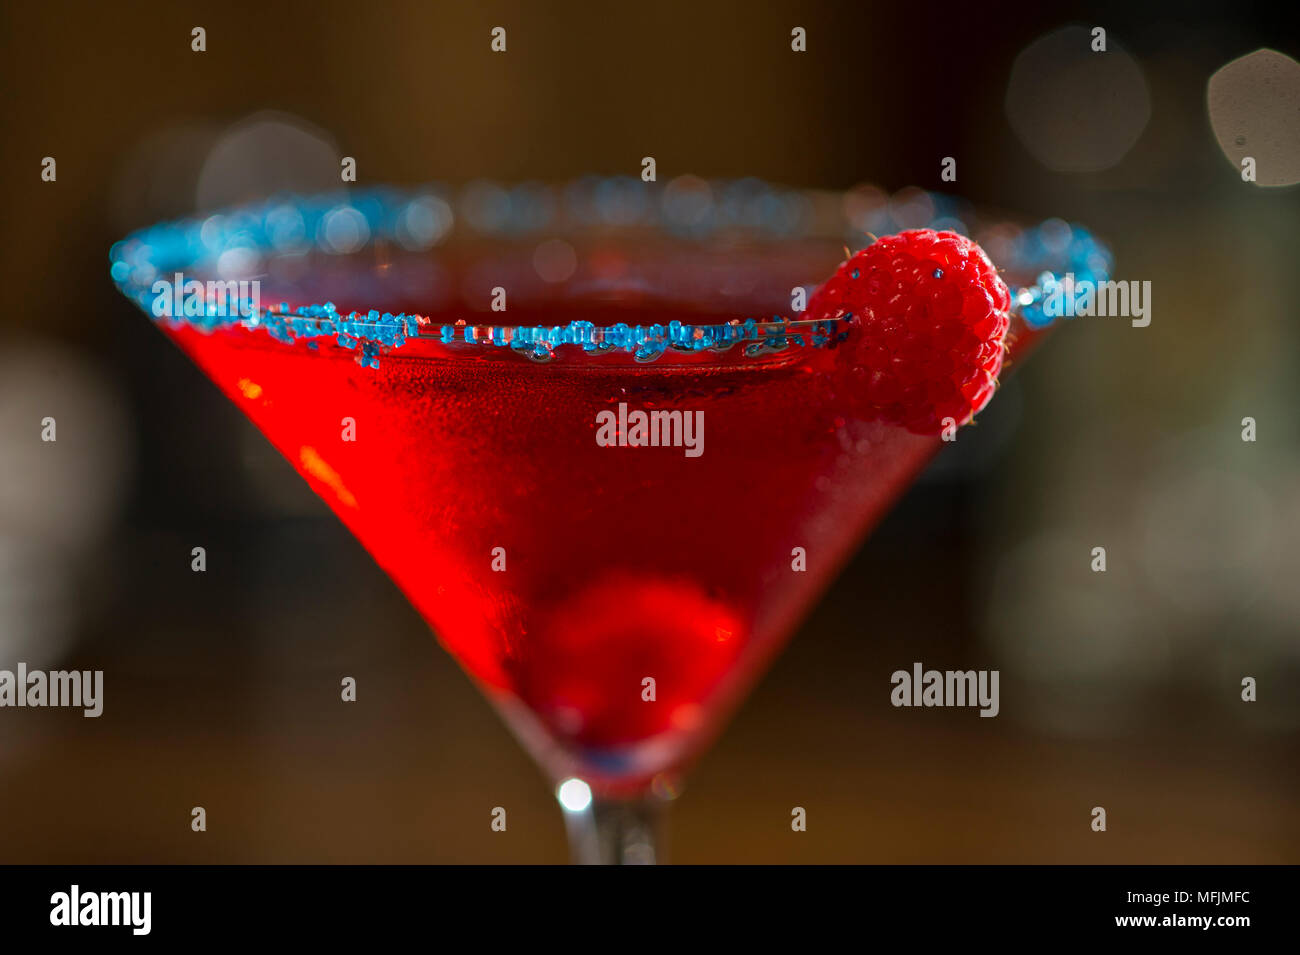 A Cosmopolitan cocktail at a restaurant. Stock Photo